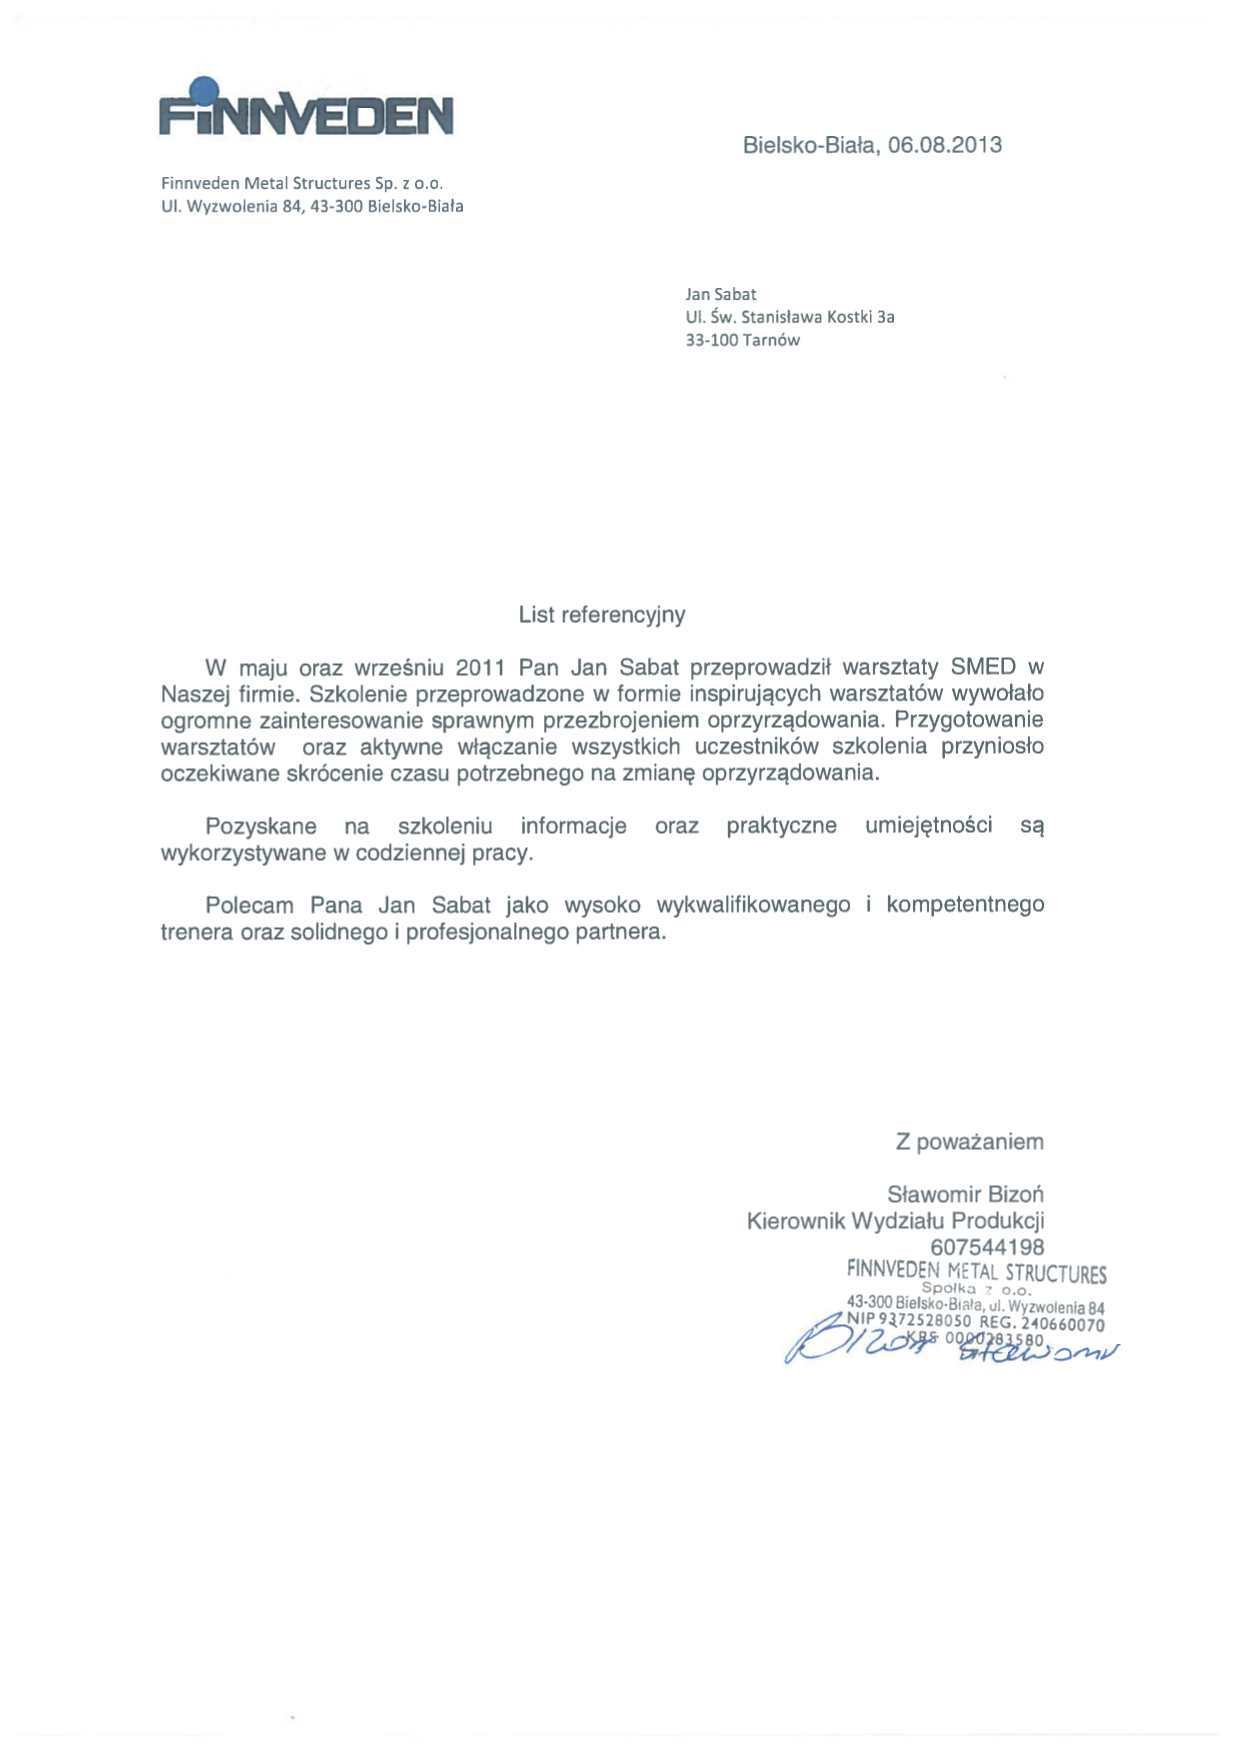 Sabat Consulting - Finnveden - referencje